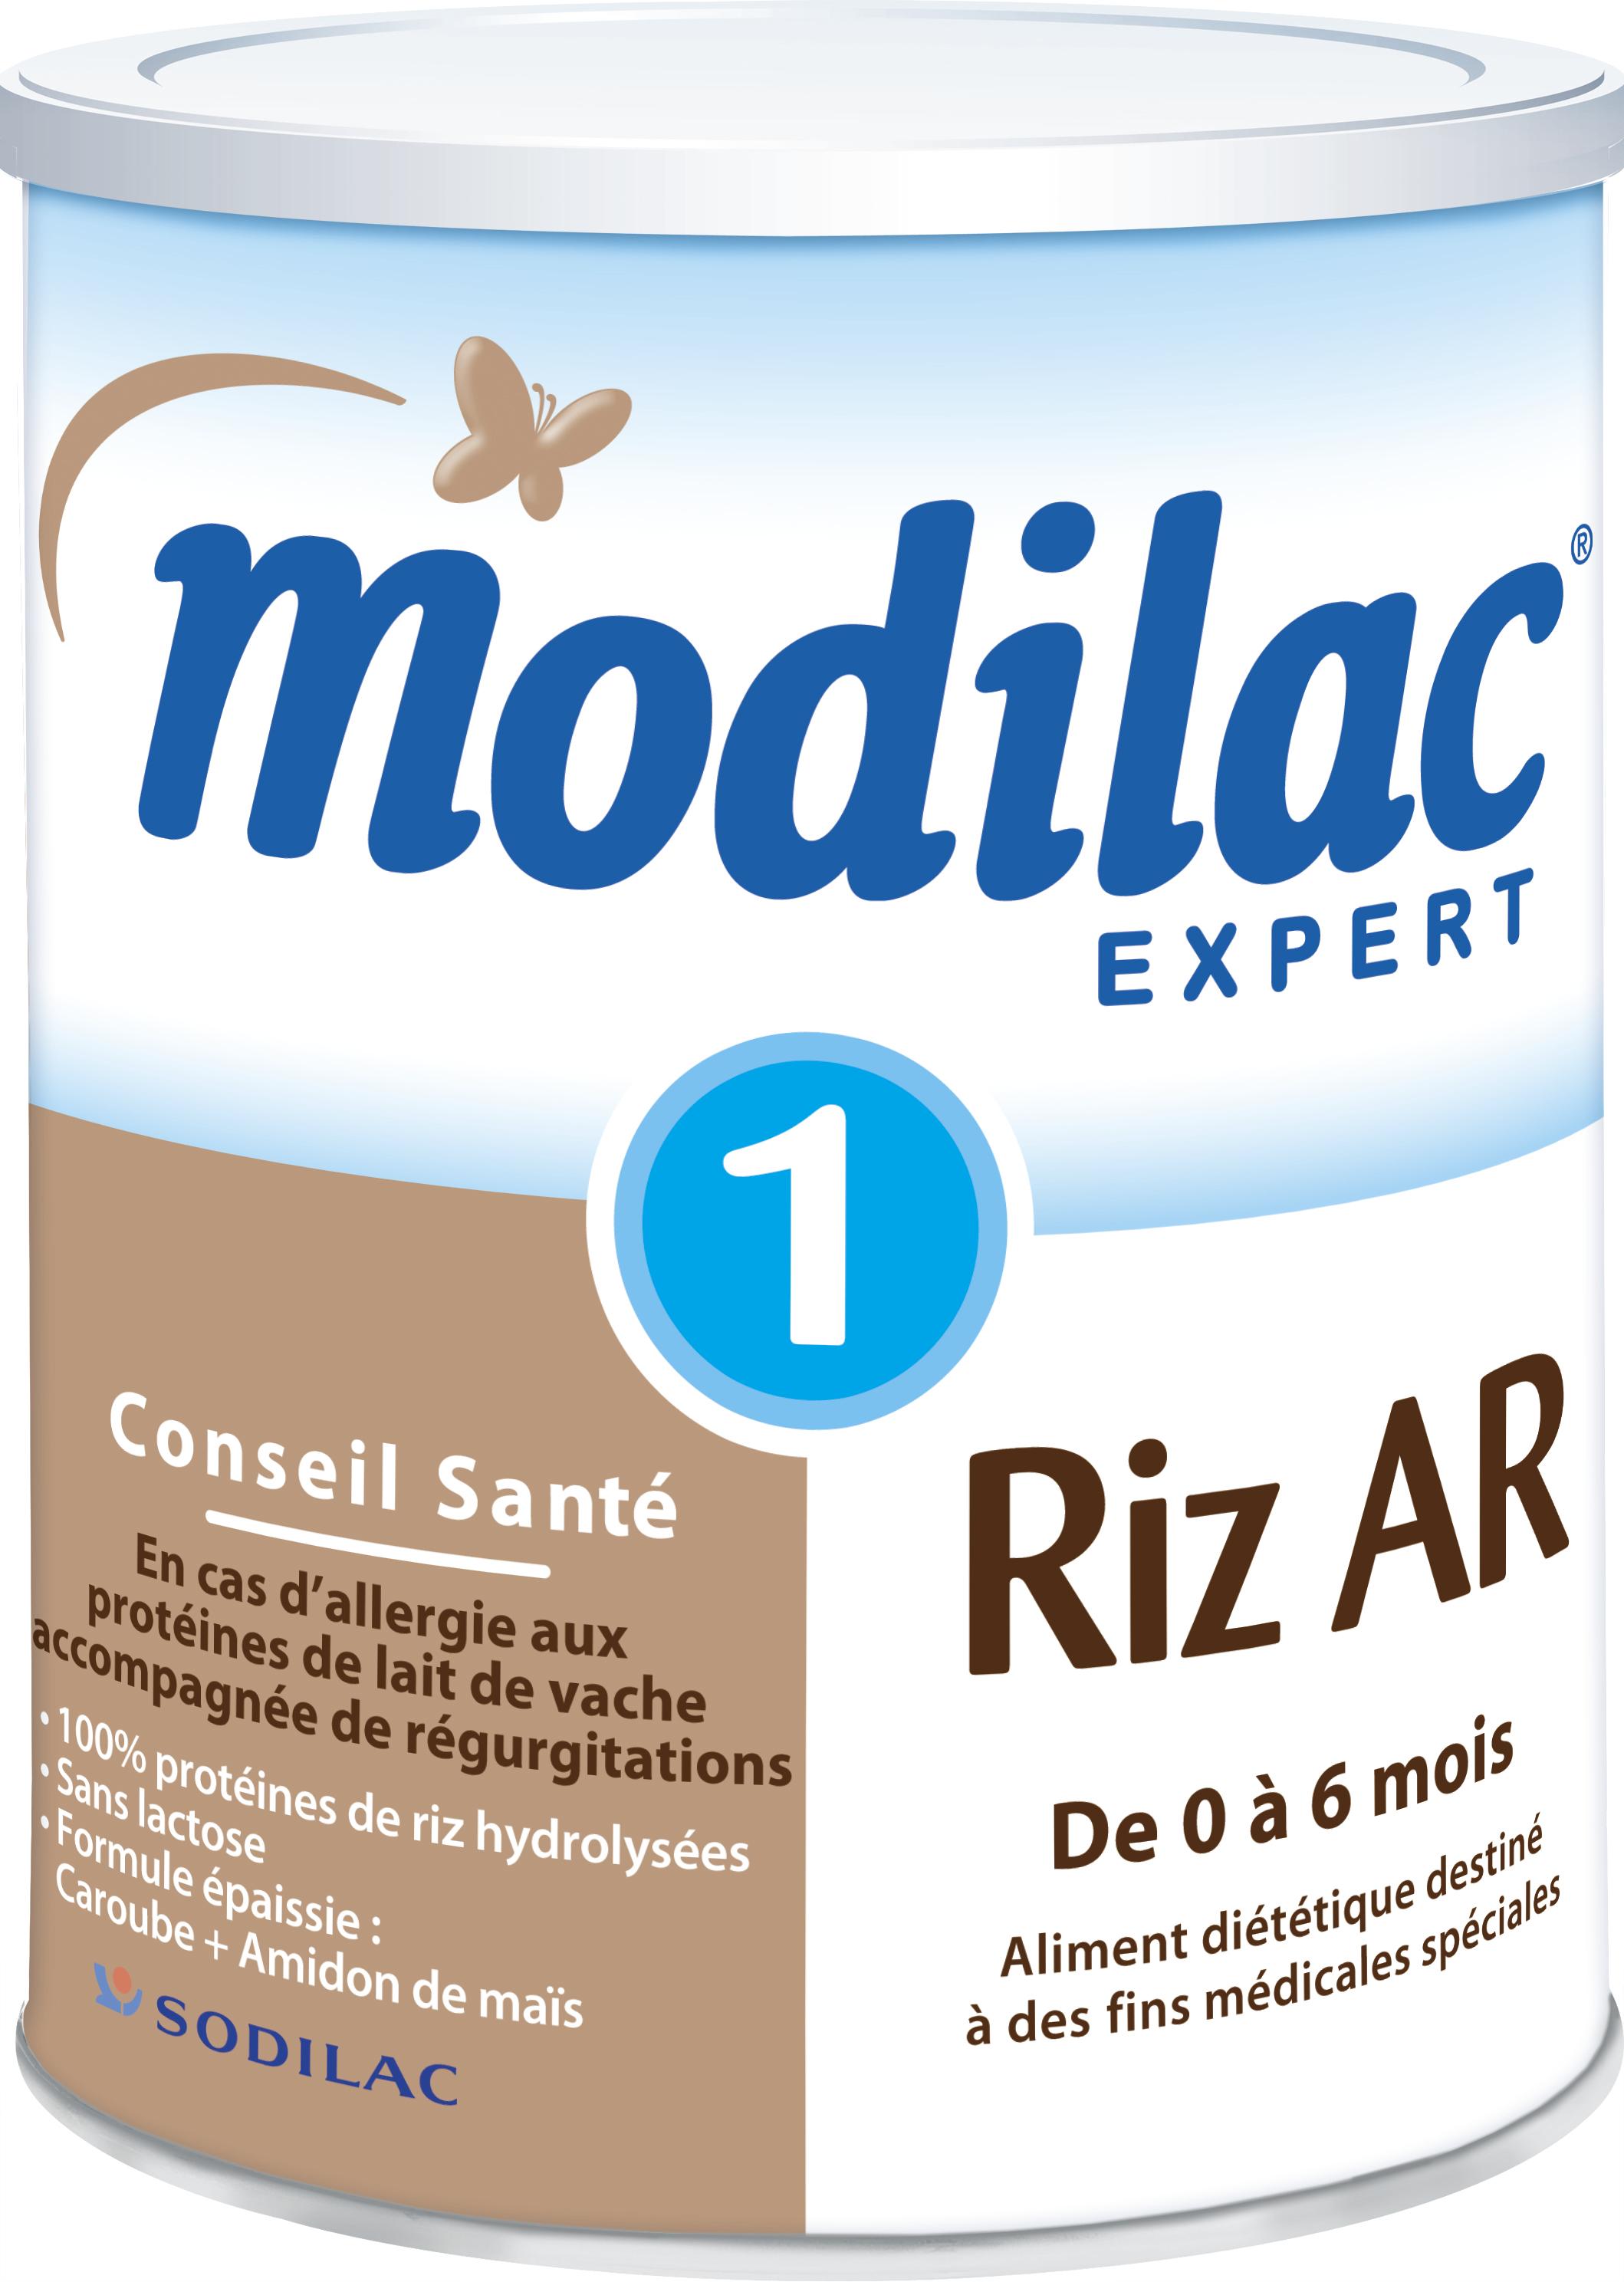 Lait Expert Riz AR 1 MODILAC